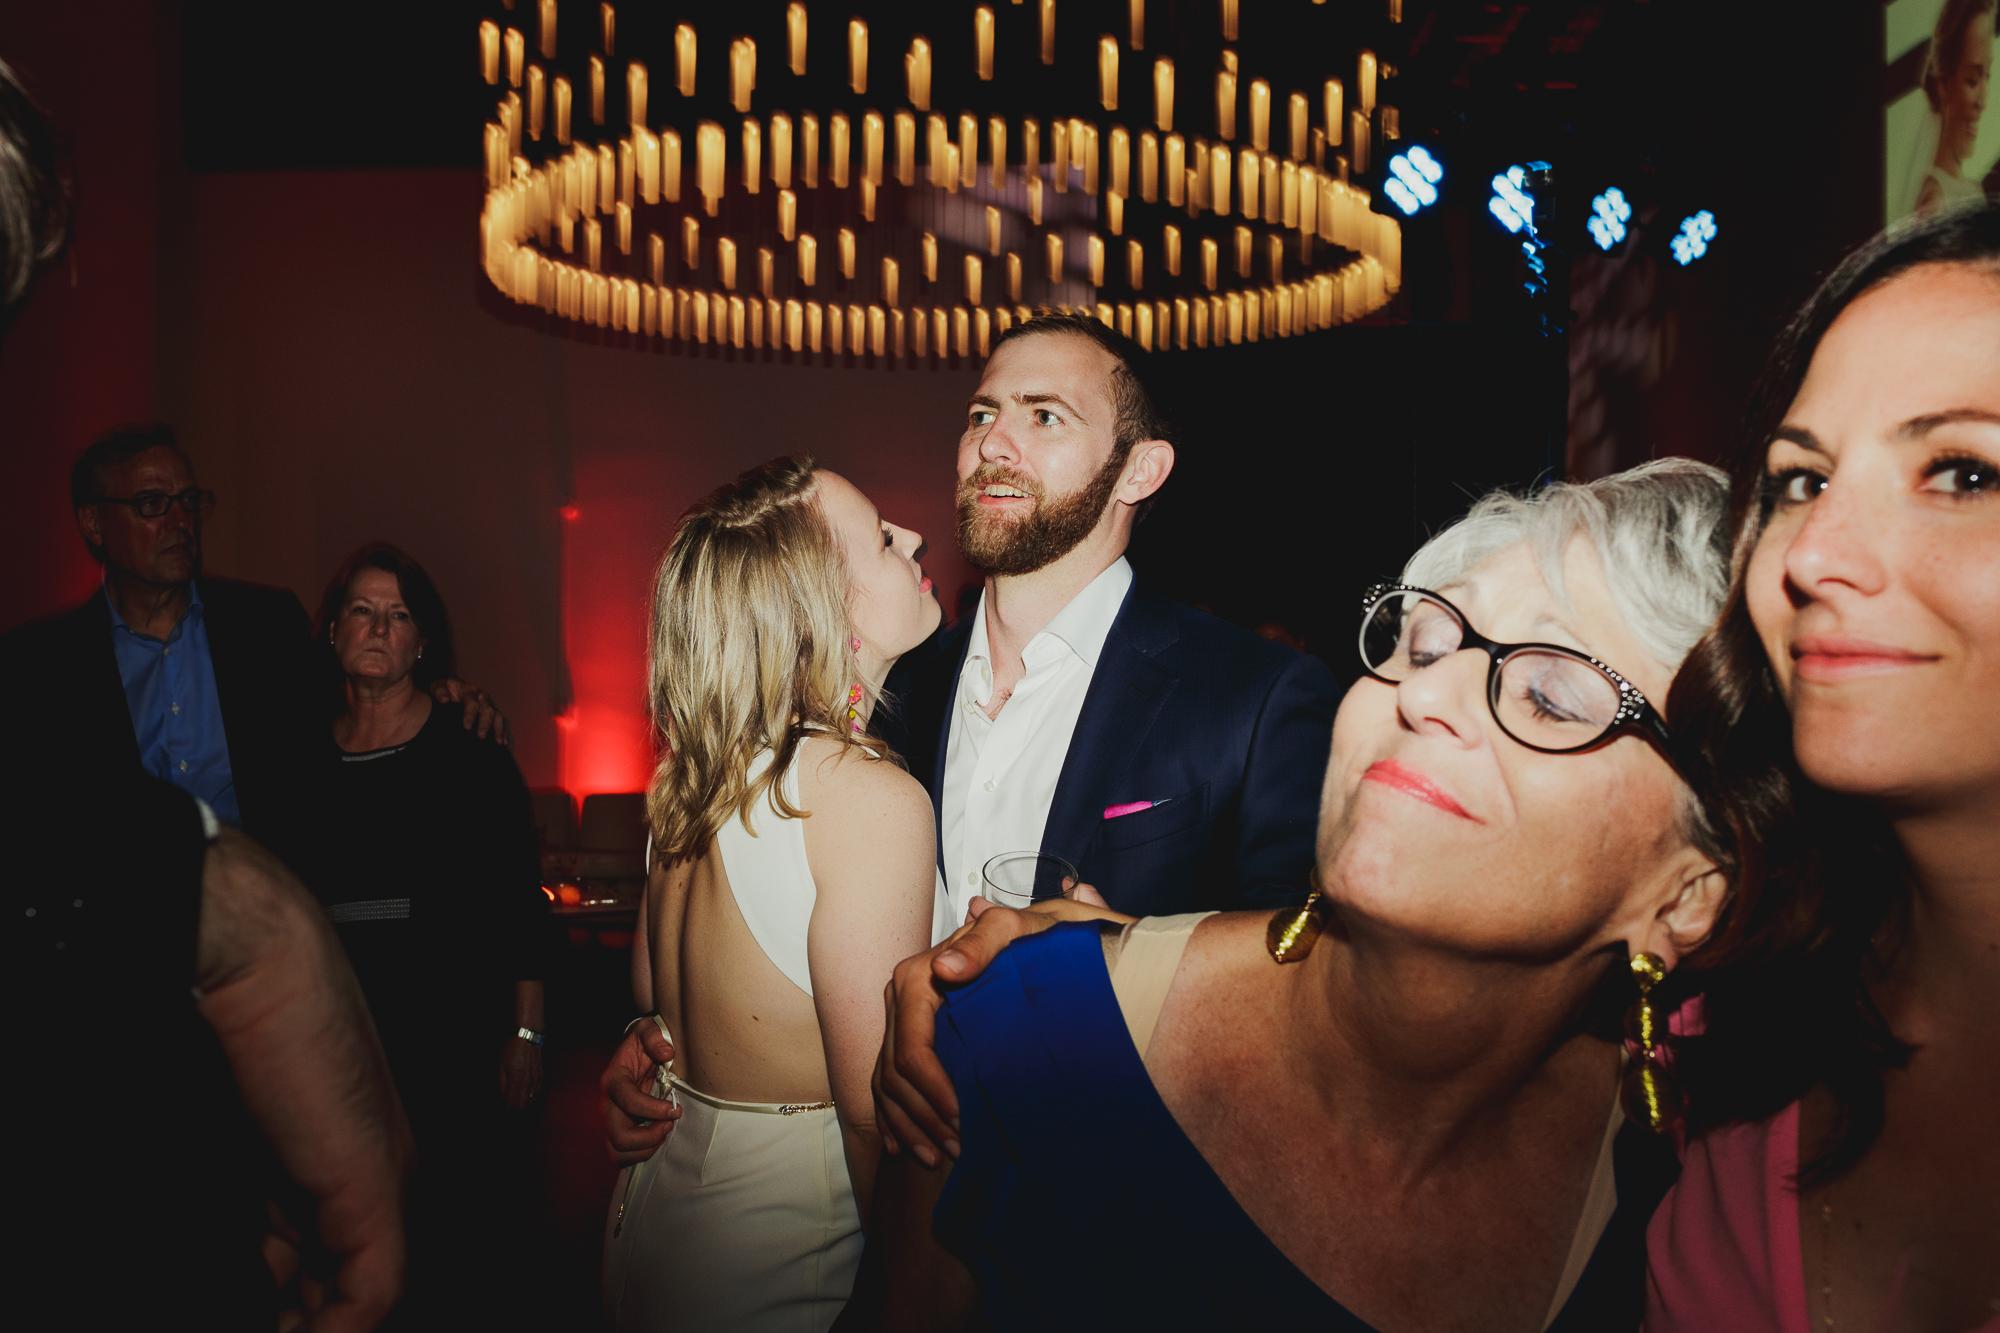 canvas event space wedding photos by Krista Welch-0153.jpg